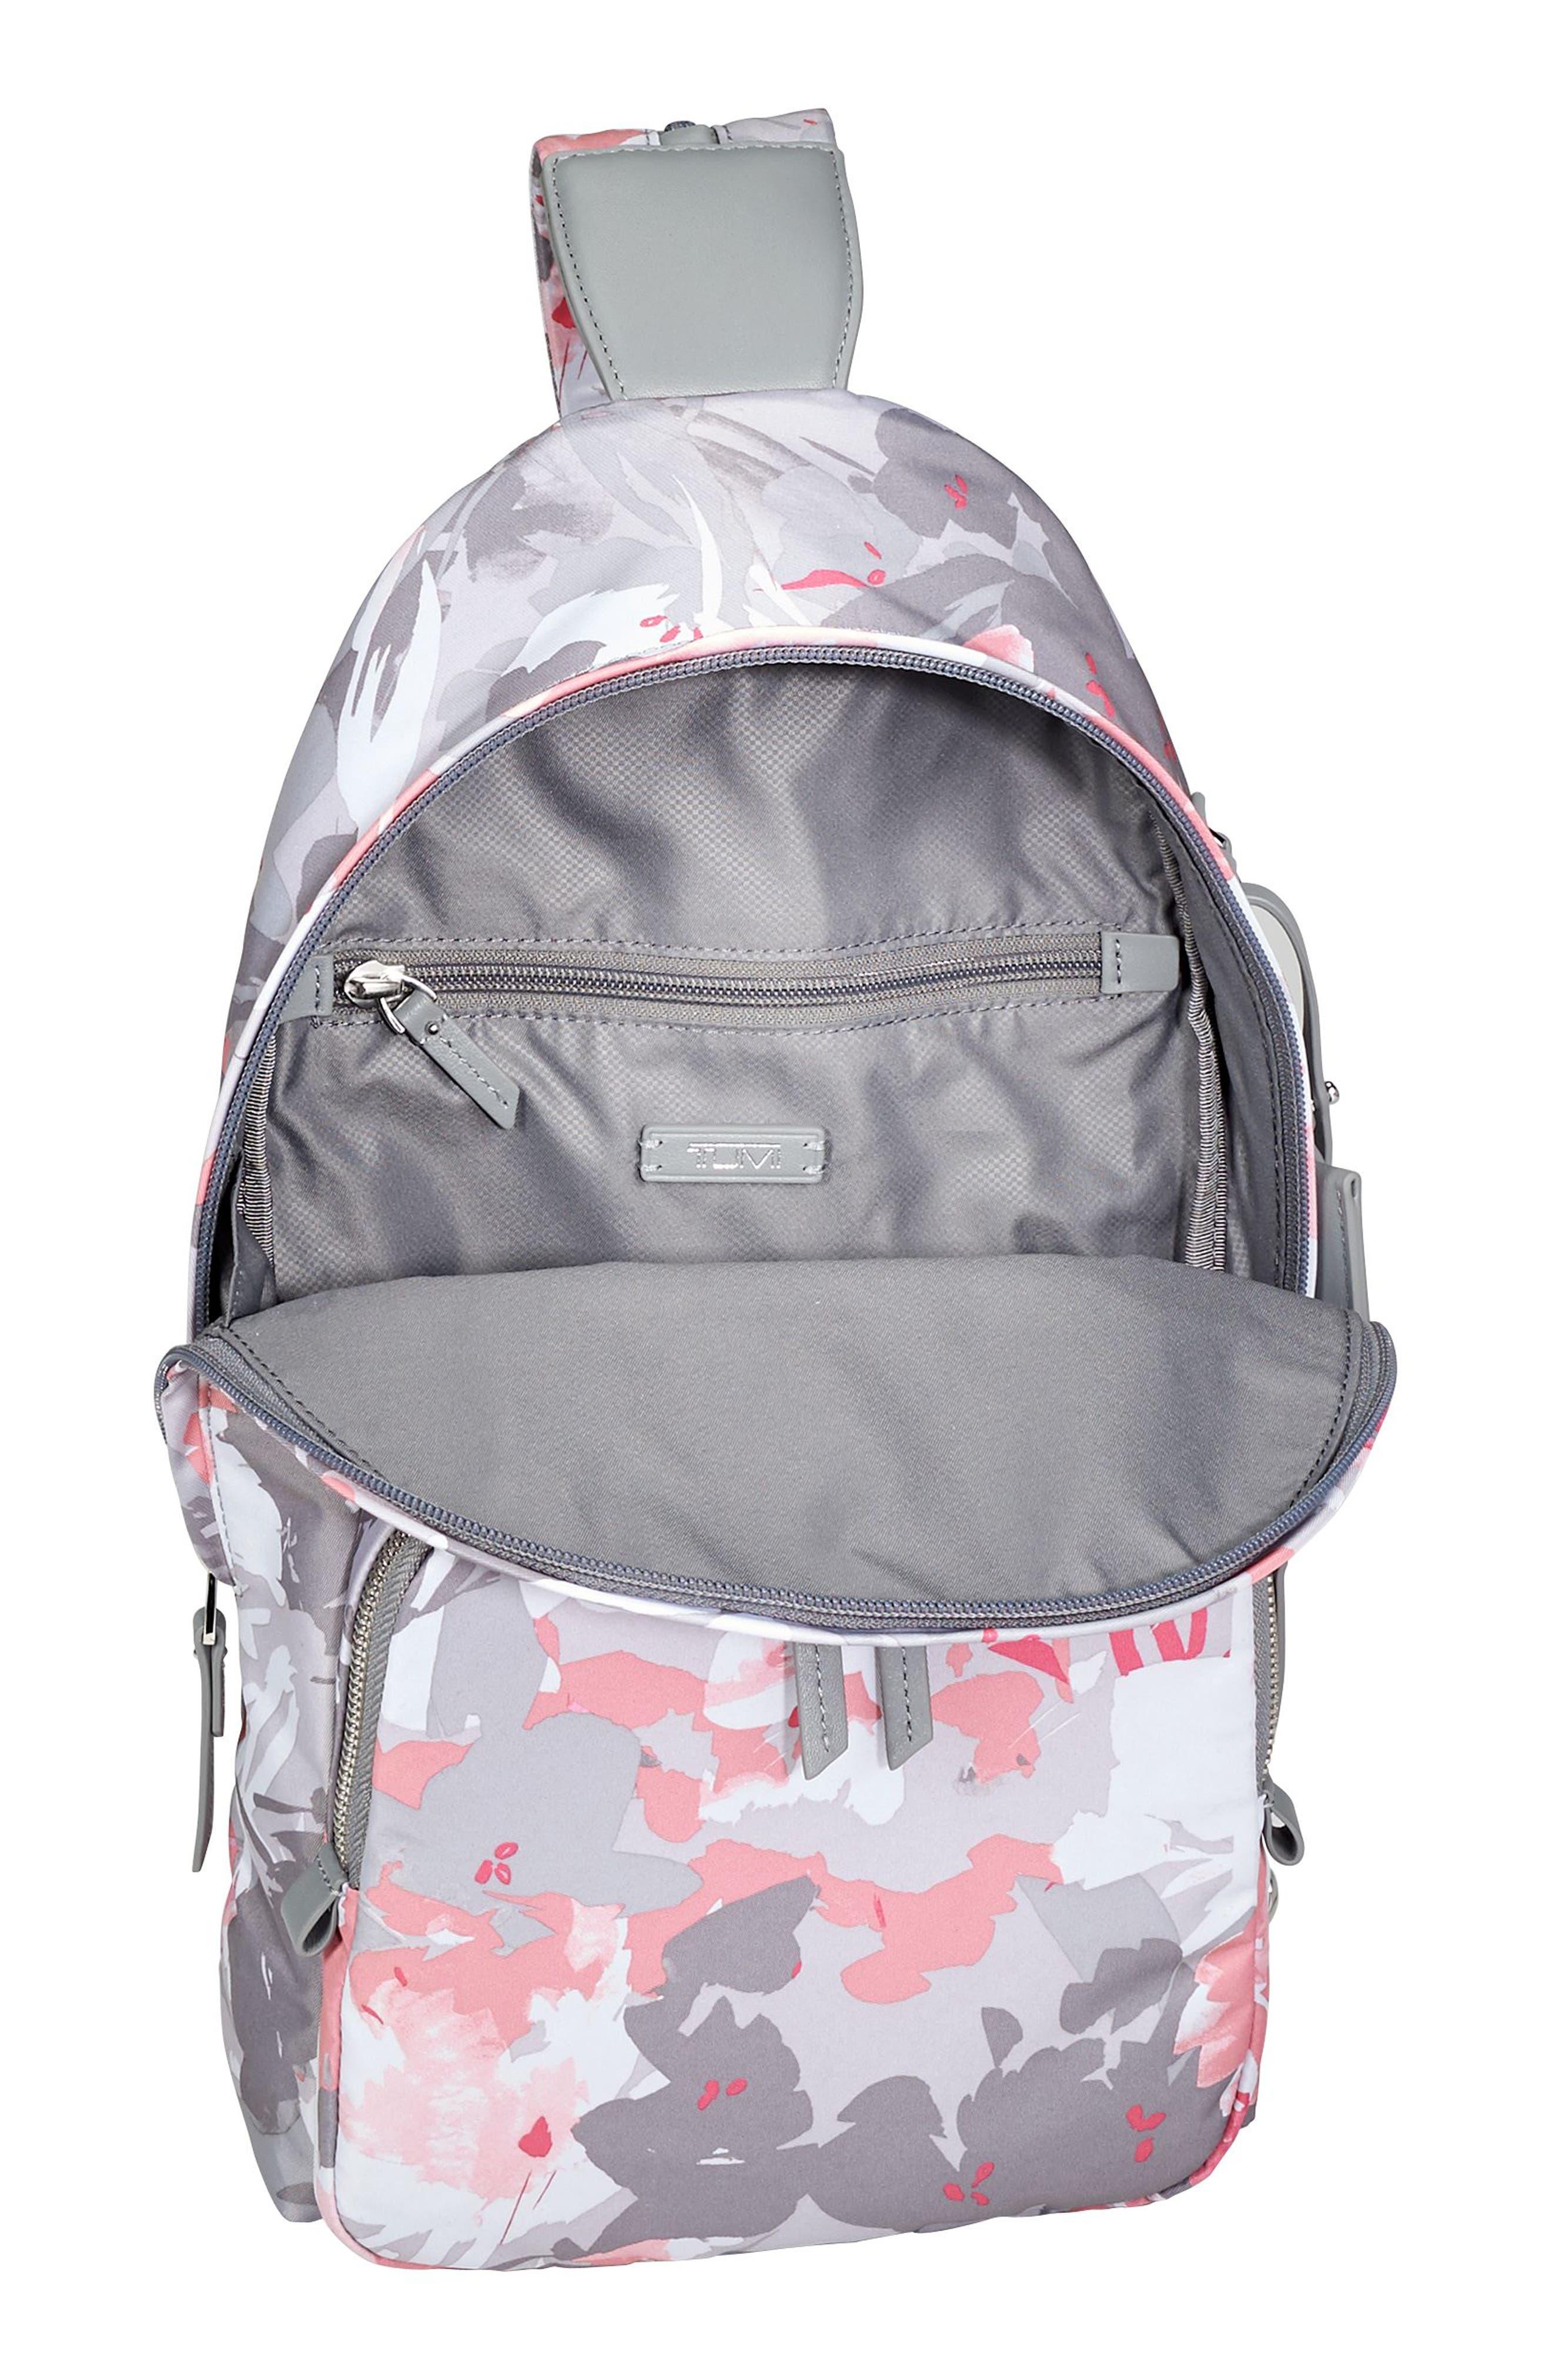 Nadia Convertible Backpack,                             Alternate thumbnail 3, color,                             Grey Floral Print